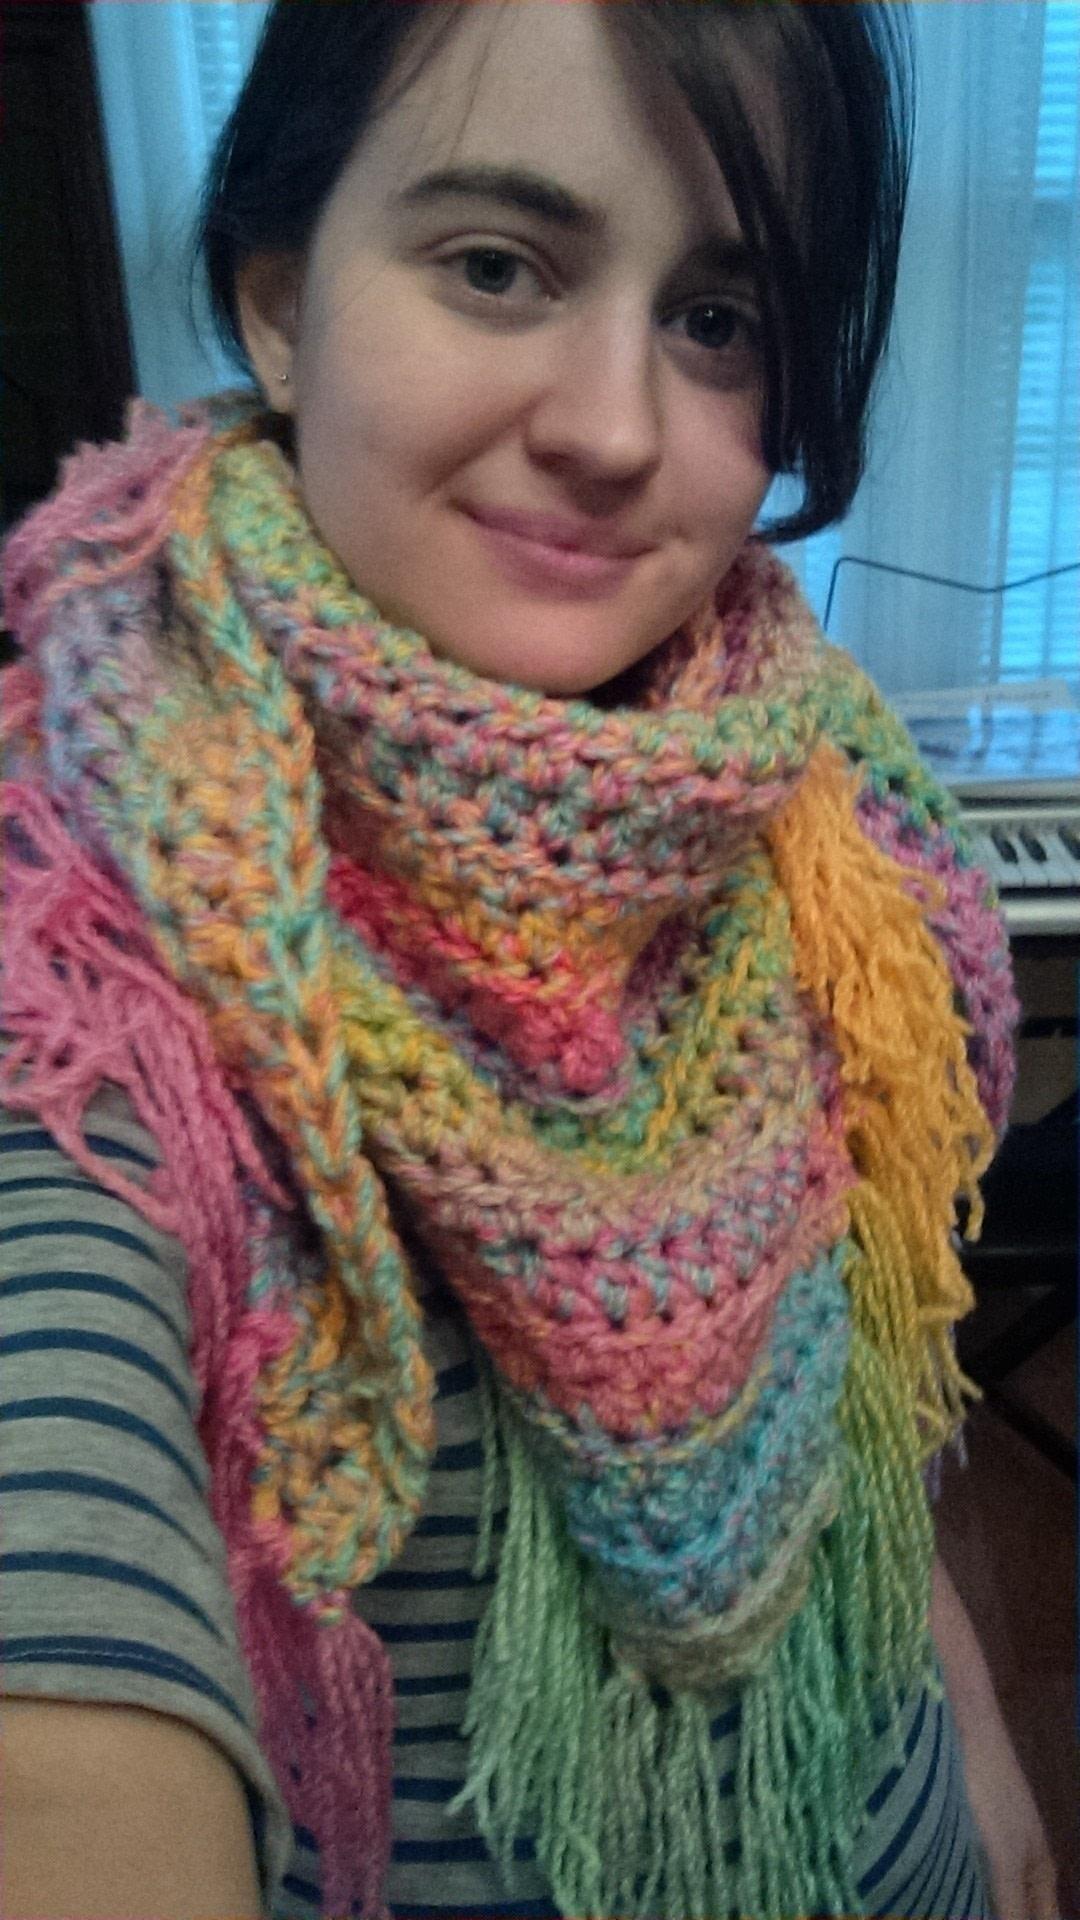 Rainbow Triangle Scarf How To Make A Knit Scarf Crochet Scarf